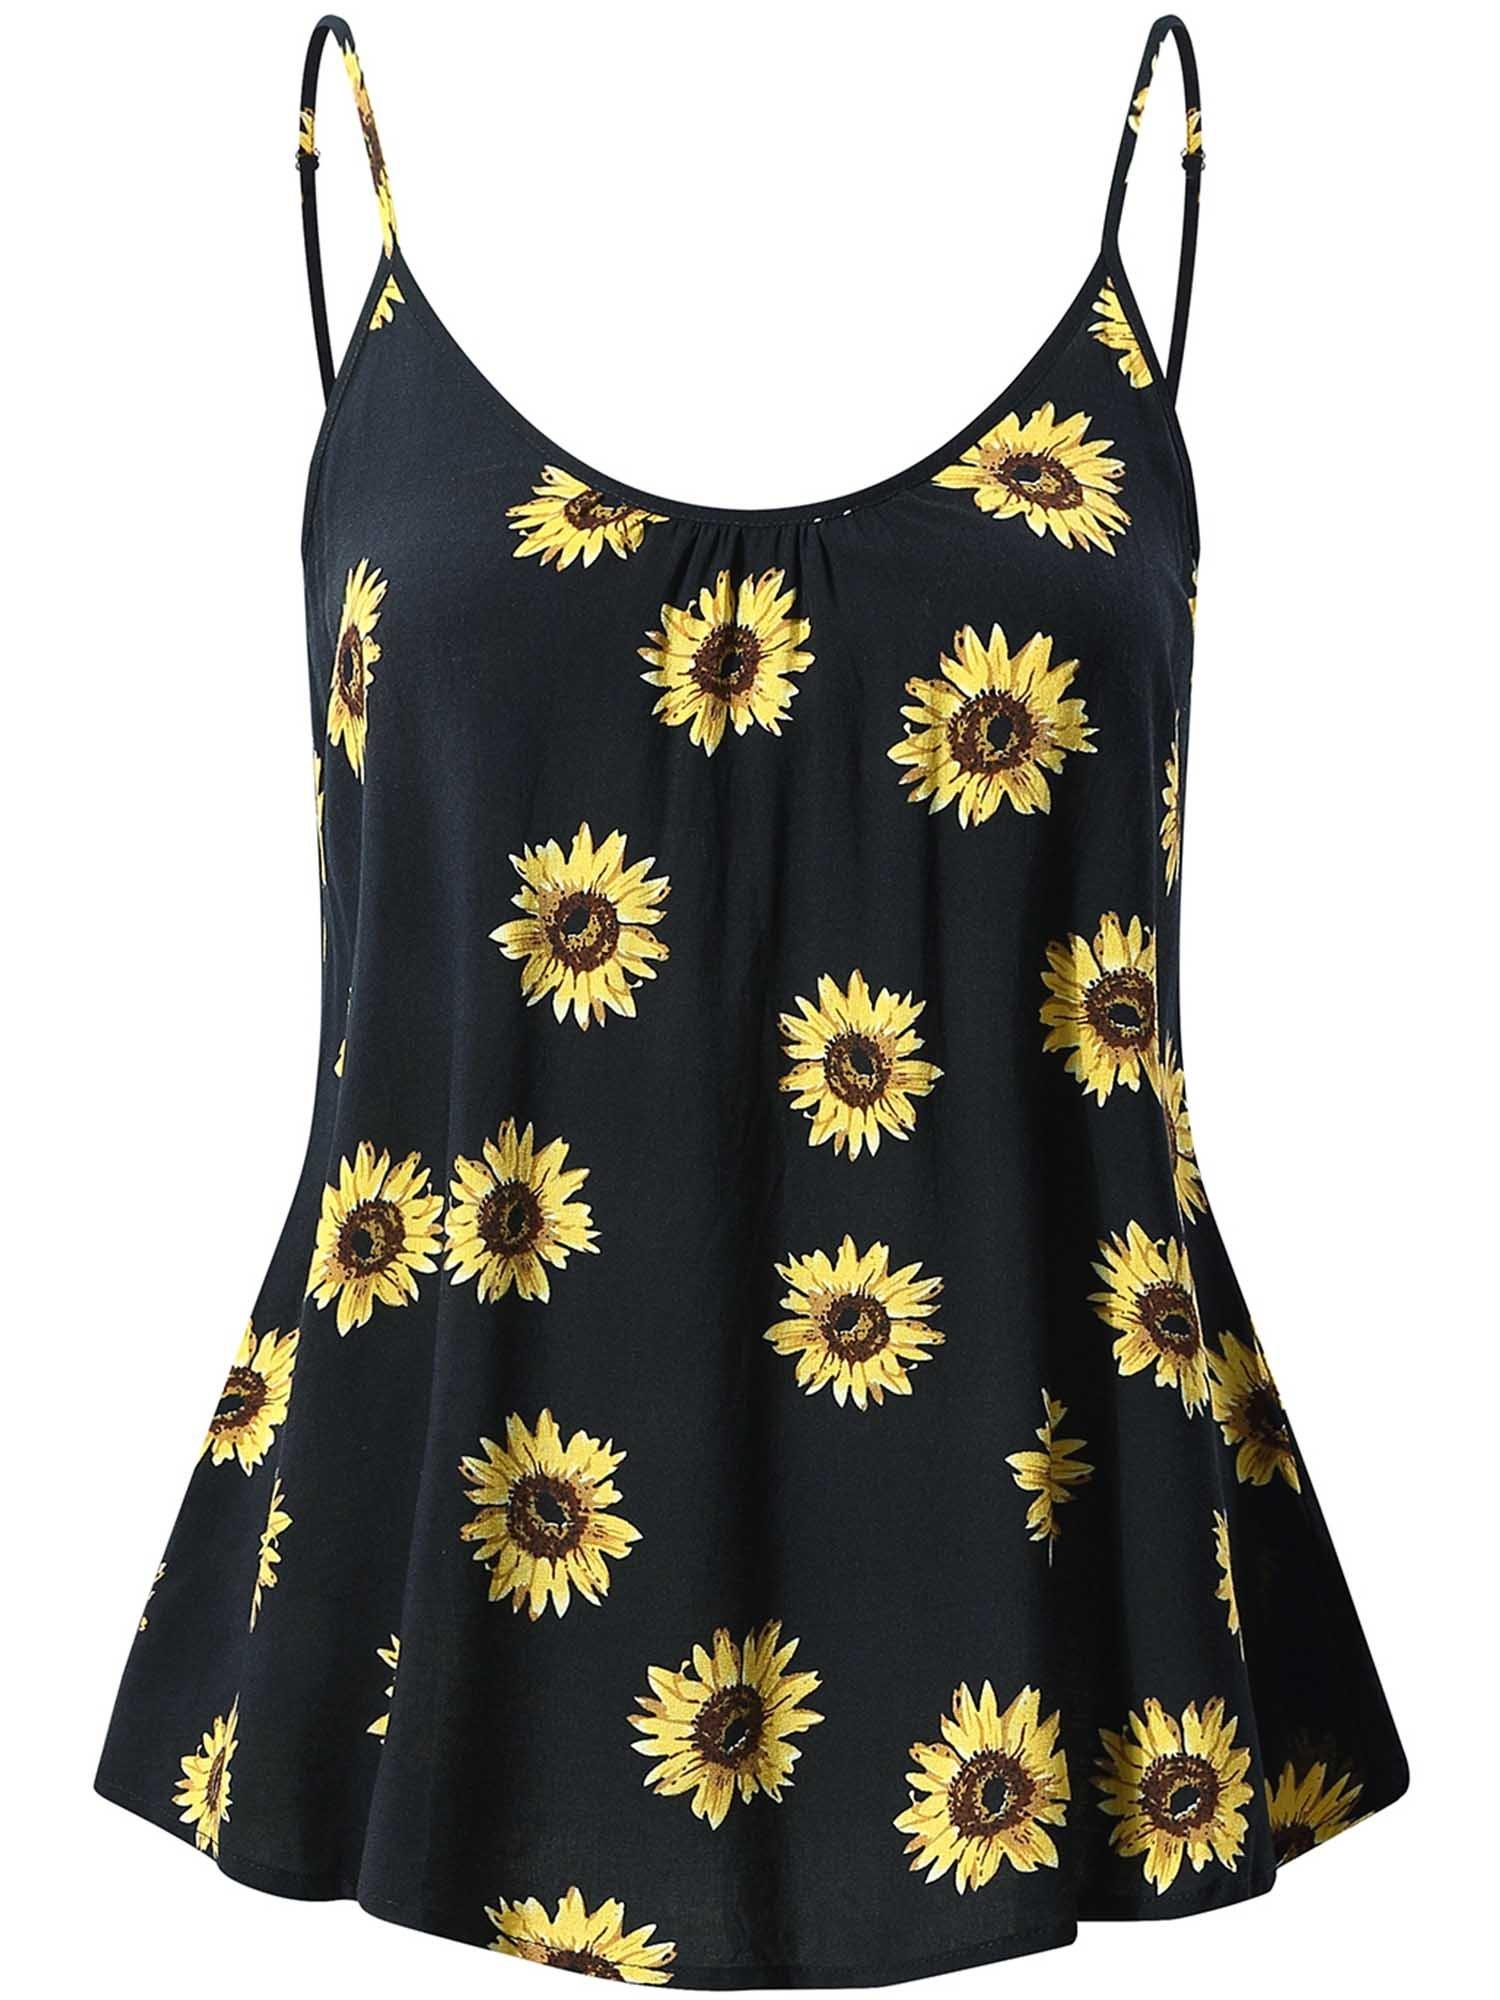 f25ba8193e1460 FENSACE Women s Sleeveless Summer Flowy Print Floral Spaghetti Strappy Tank  Tops product image